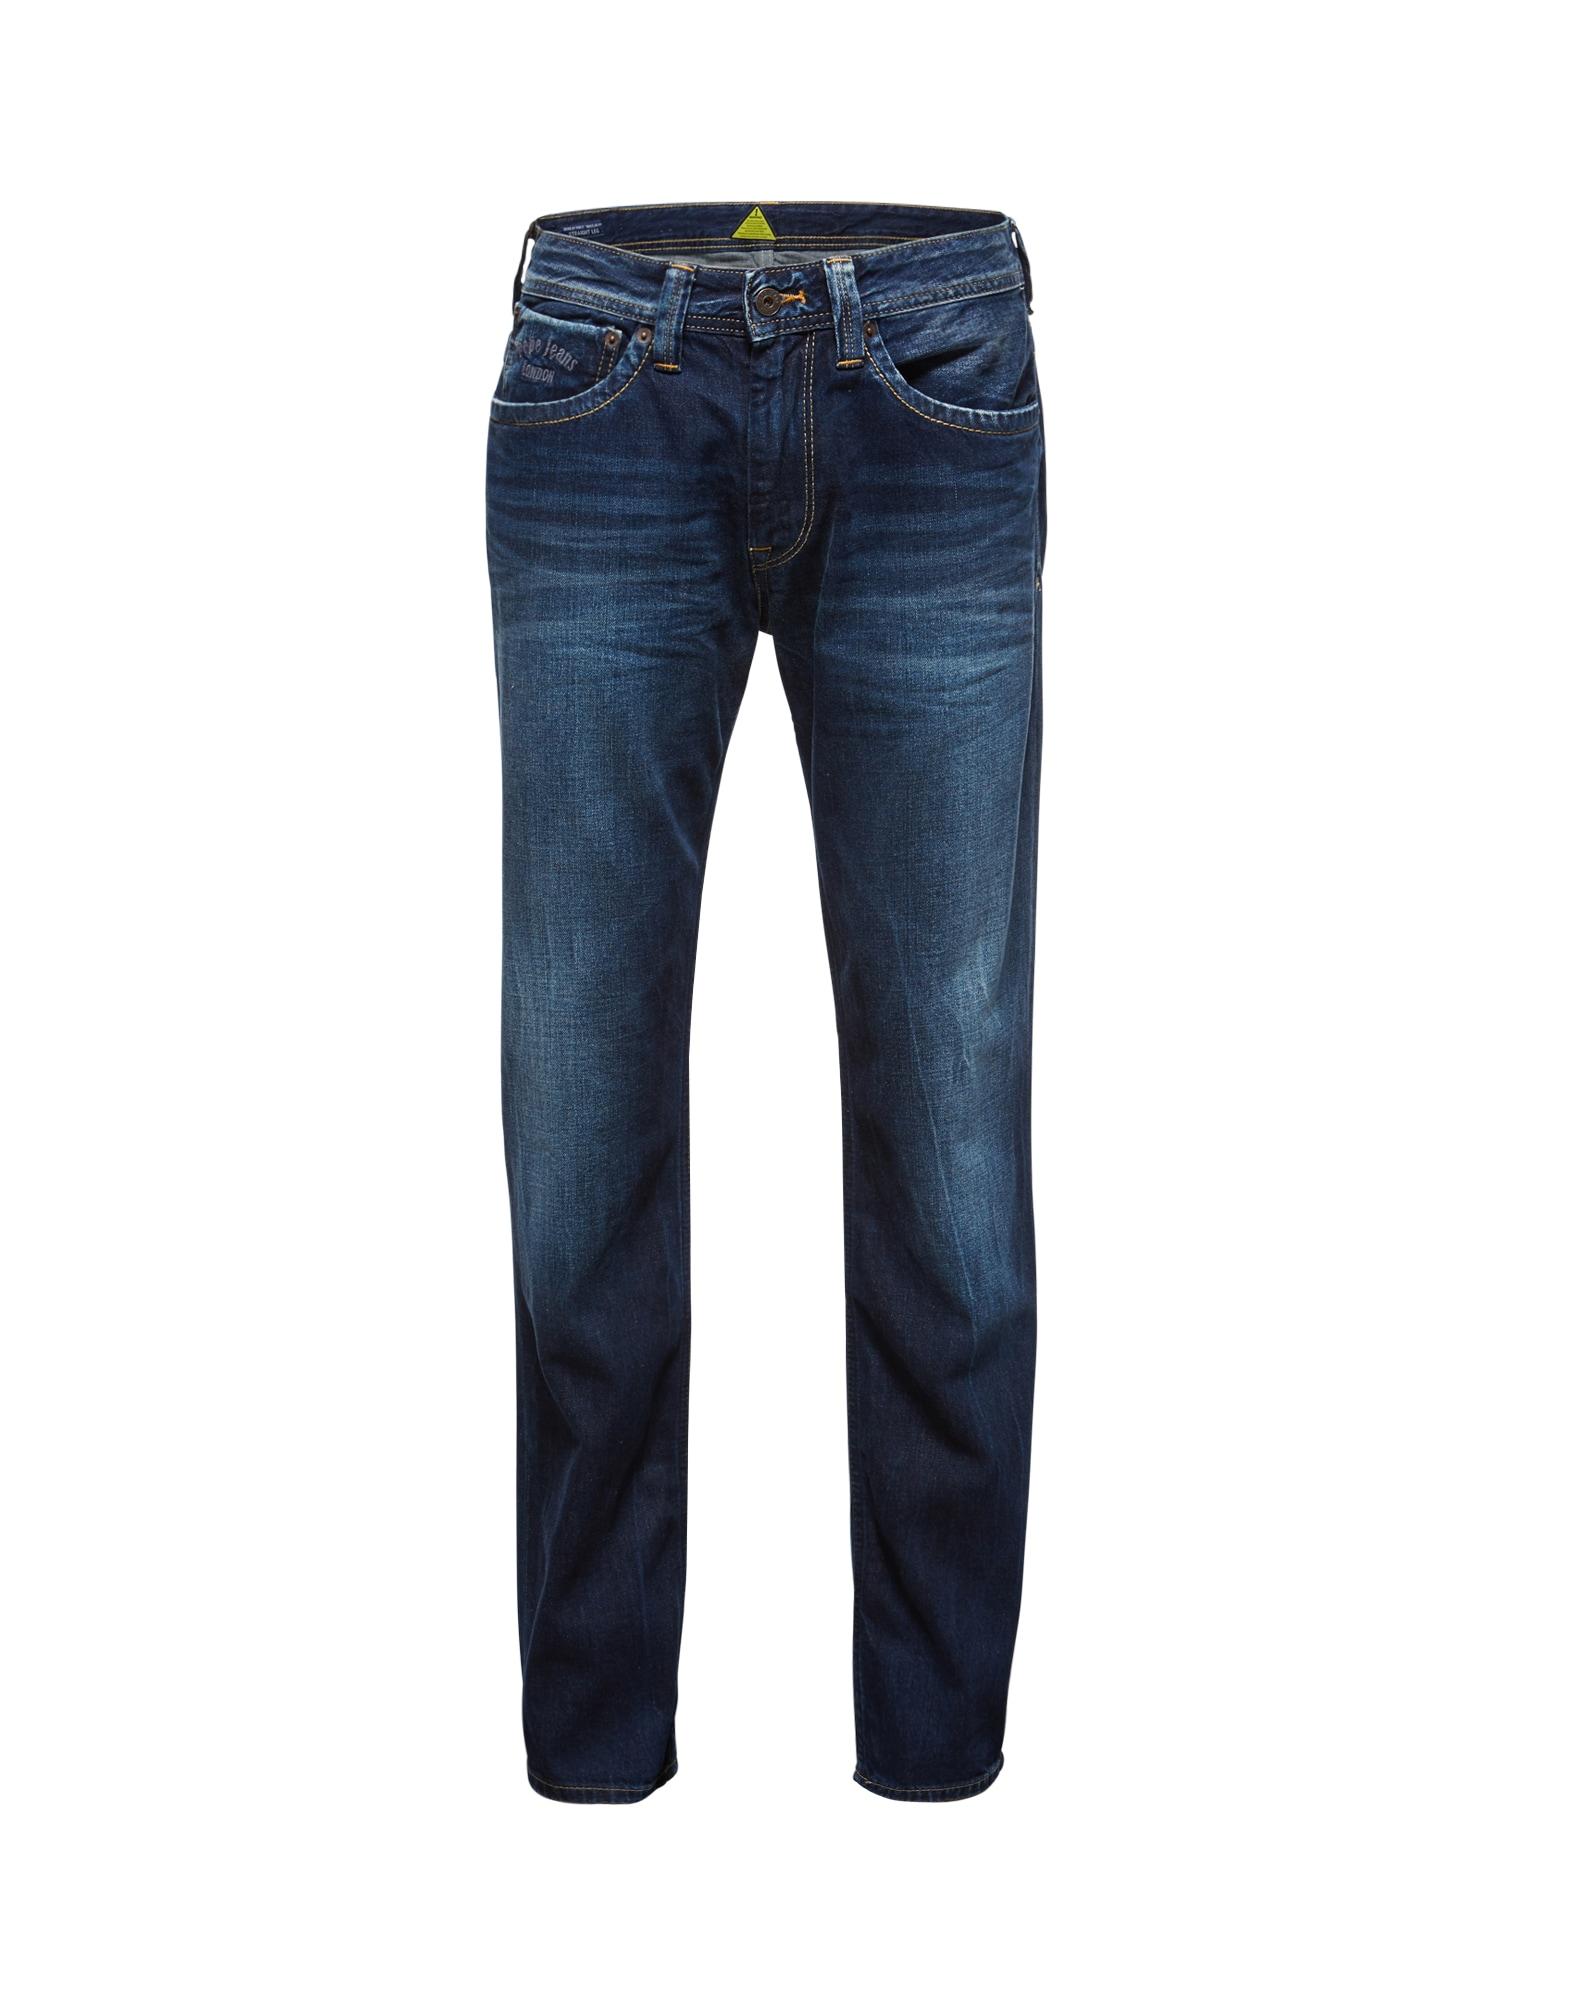 Pepe Jeans Heren Jeans blauw denim